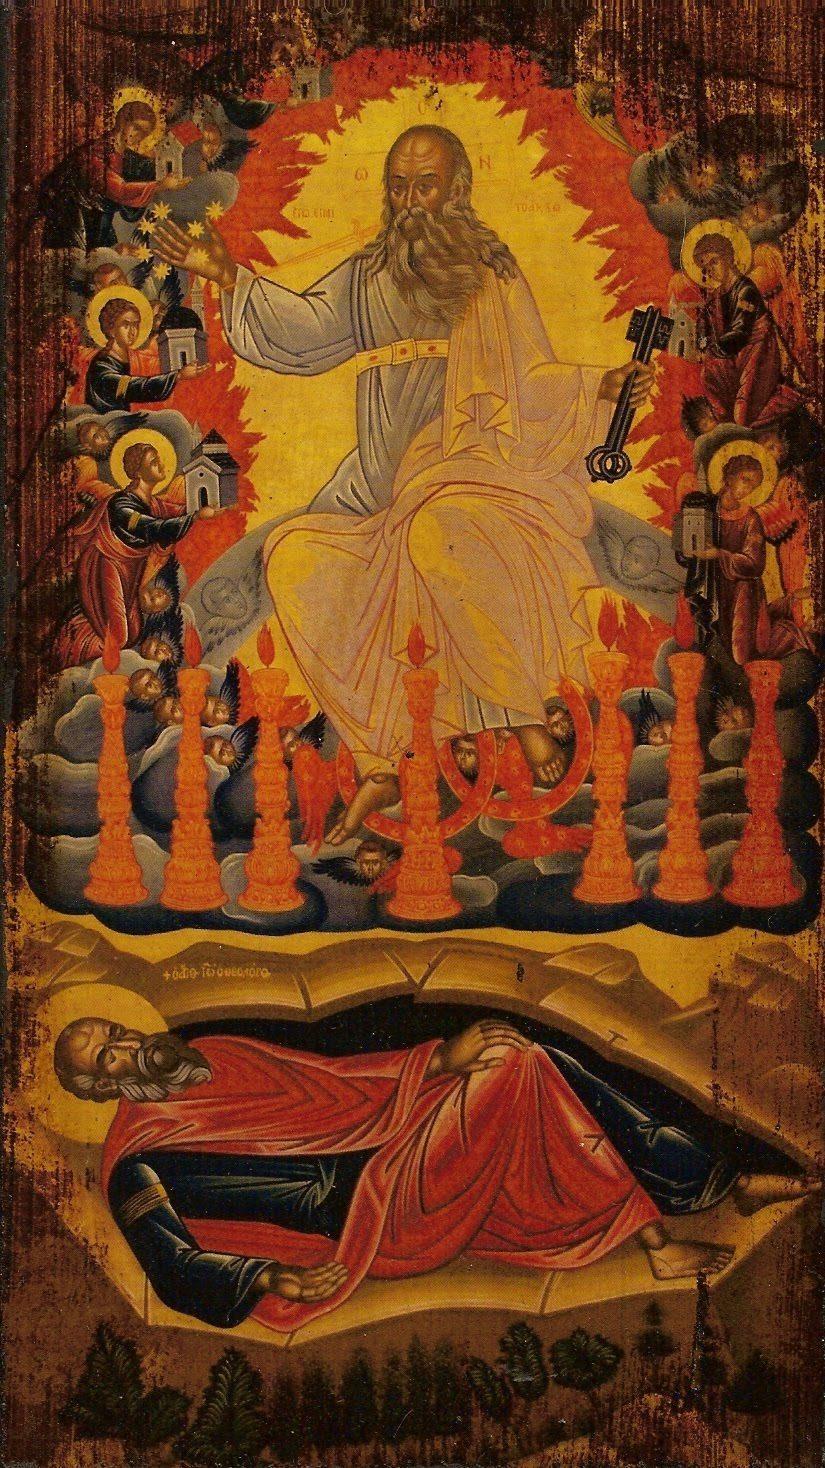 John and Revelation